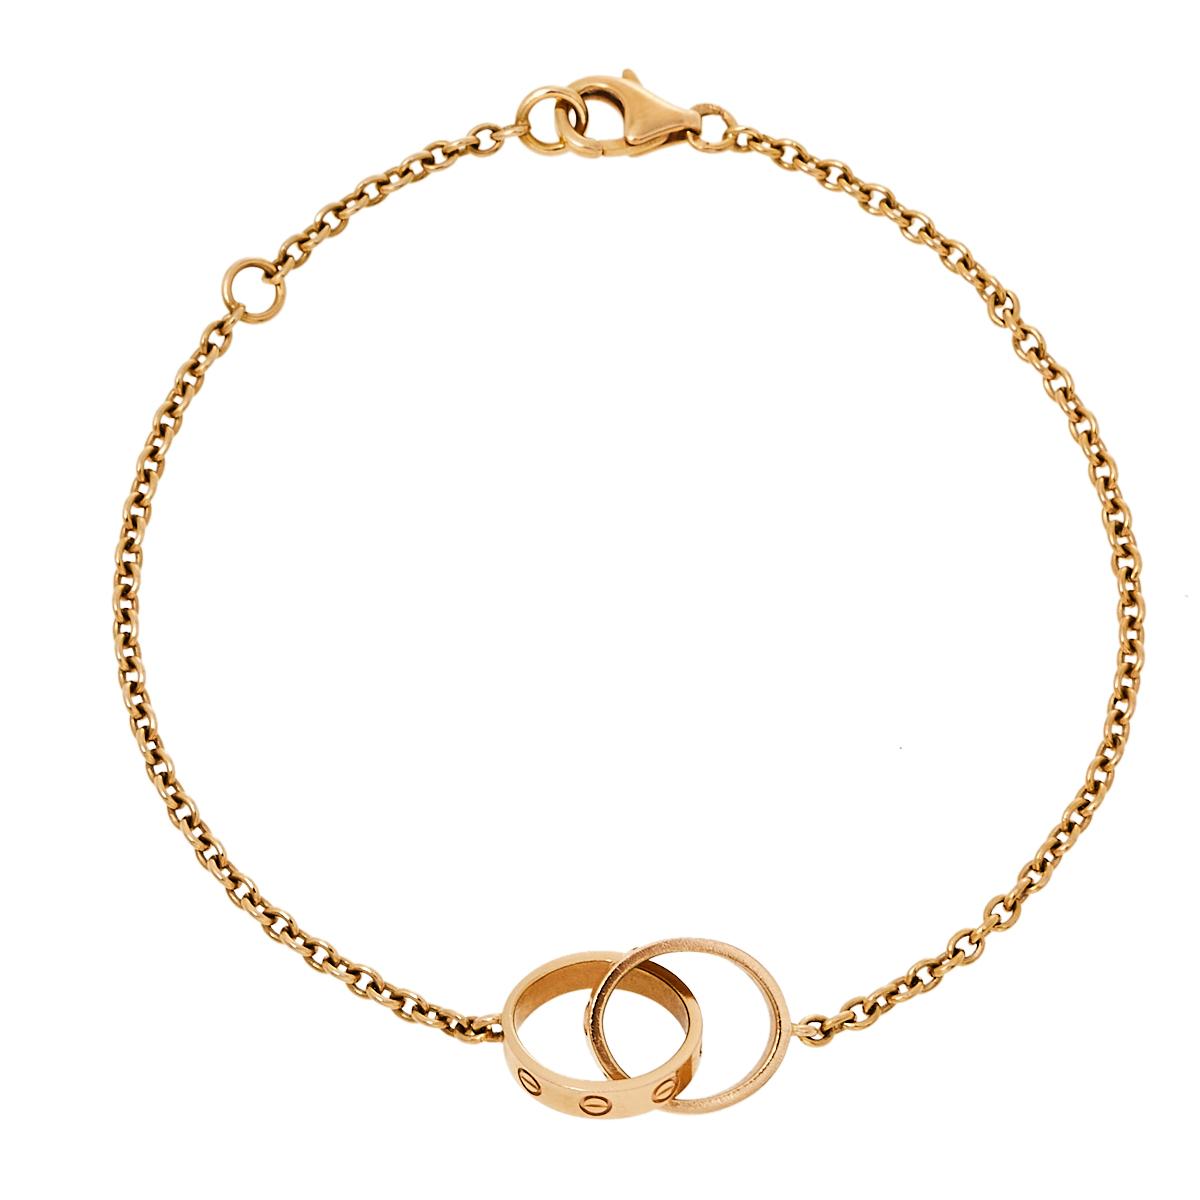 Pre-owned Cartier Love Interlocking 2 Hoops 18k Rose Gold Bracelet